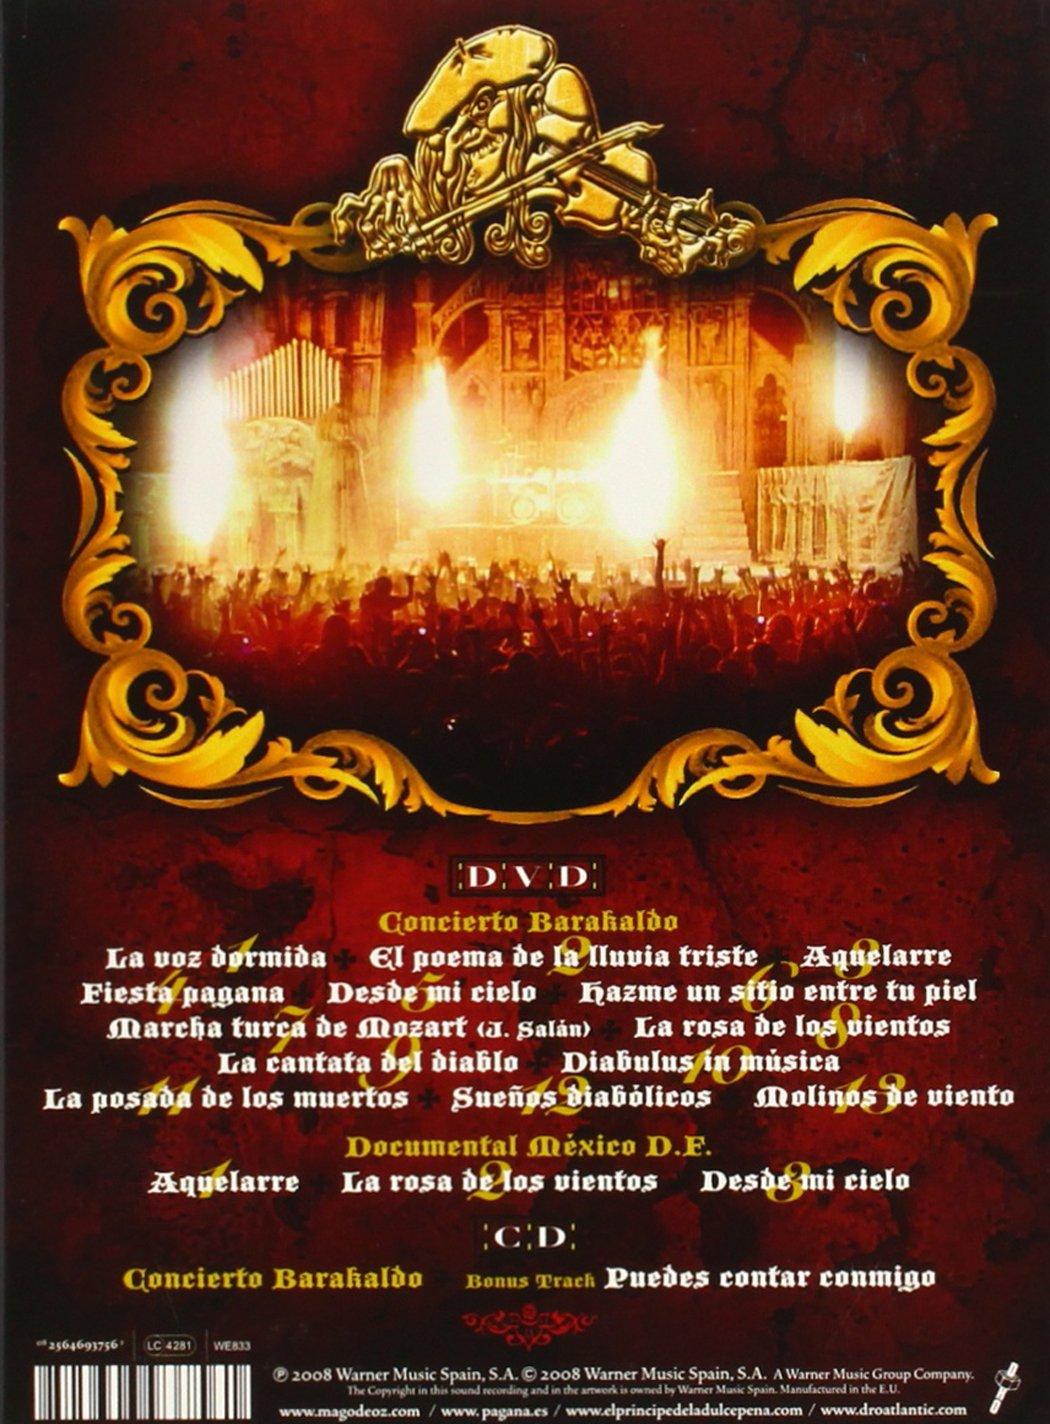 Mago De Oz Barakaldo D F Cd Dvd Music